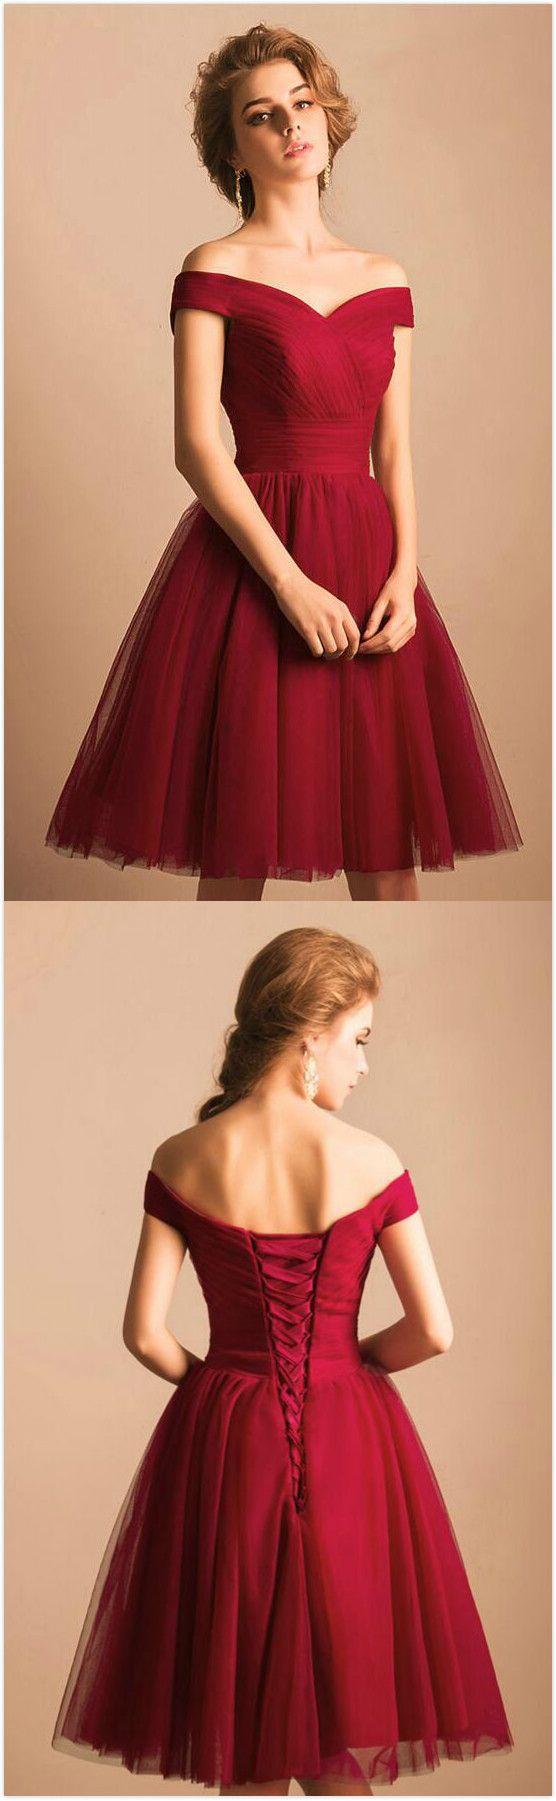 Cute tulle prom dressshort homecoming dressshort prom dresses